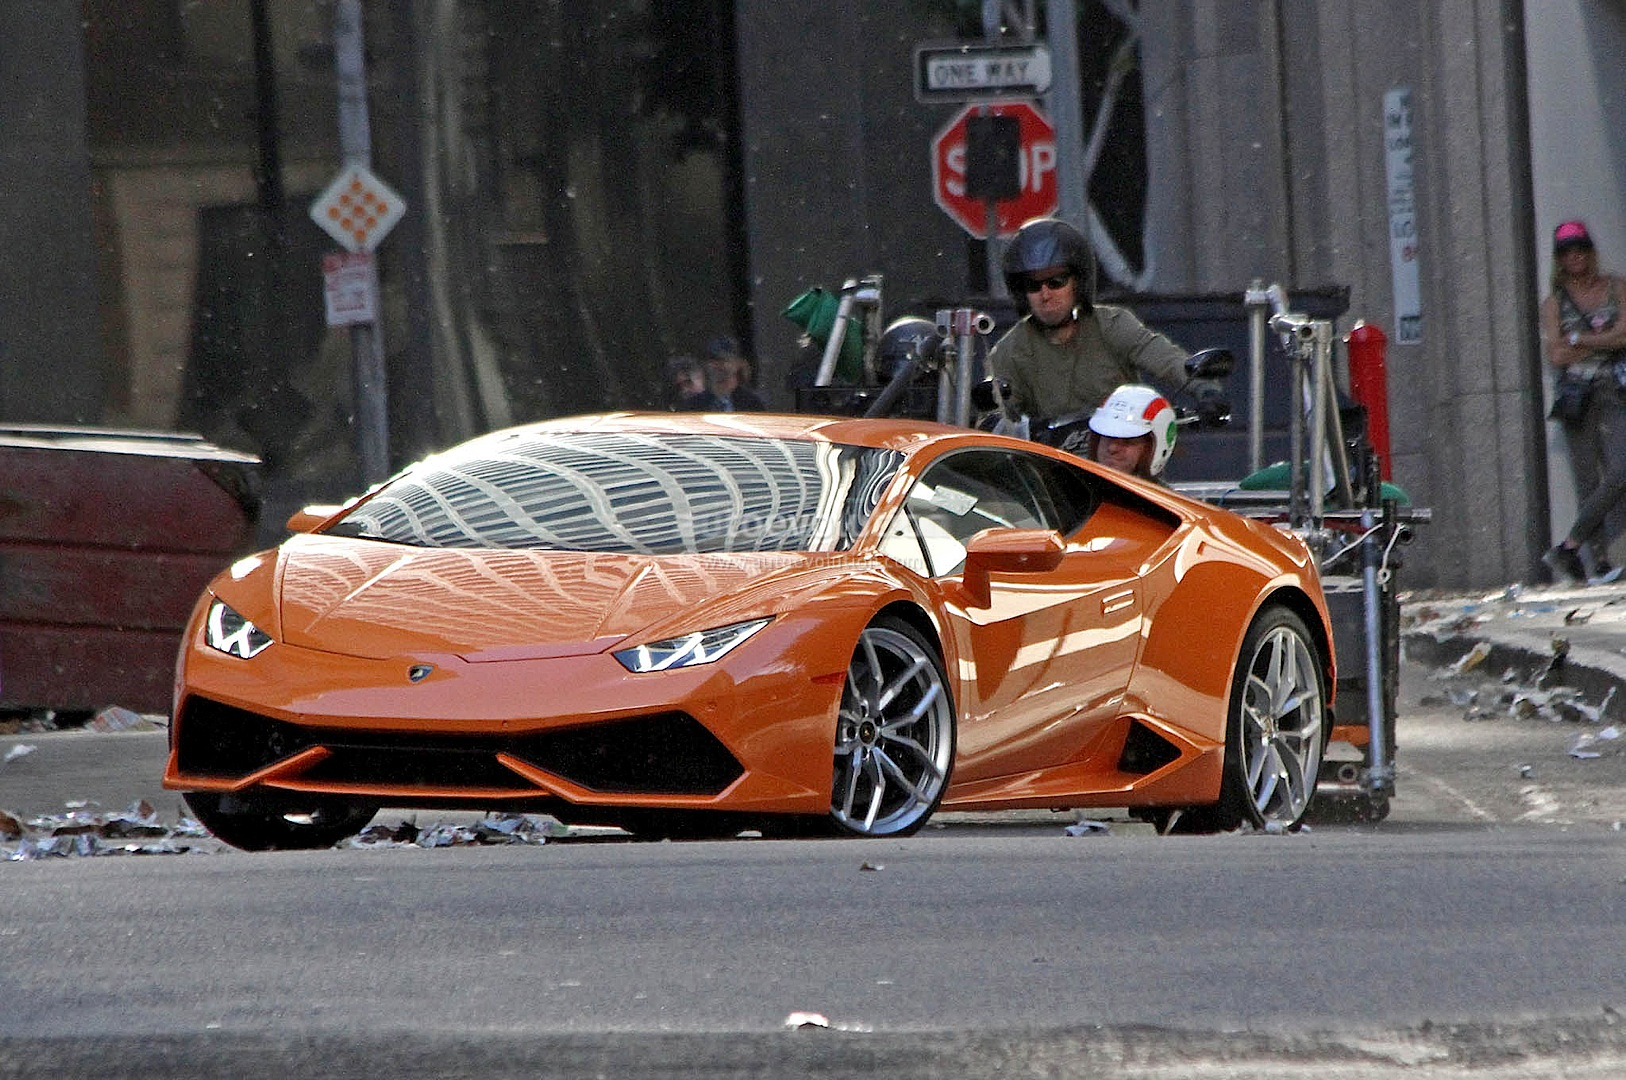 Spyshots Orange Lamborghini Huracan Street Racing In The